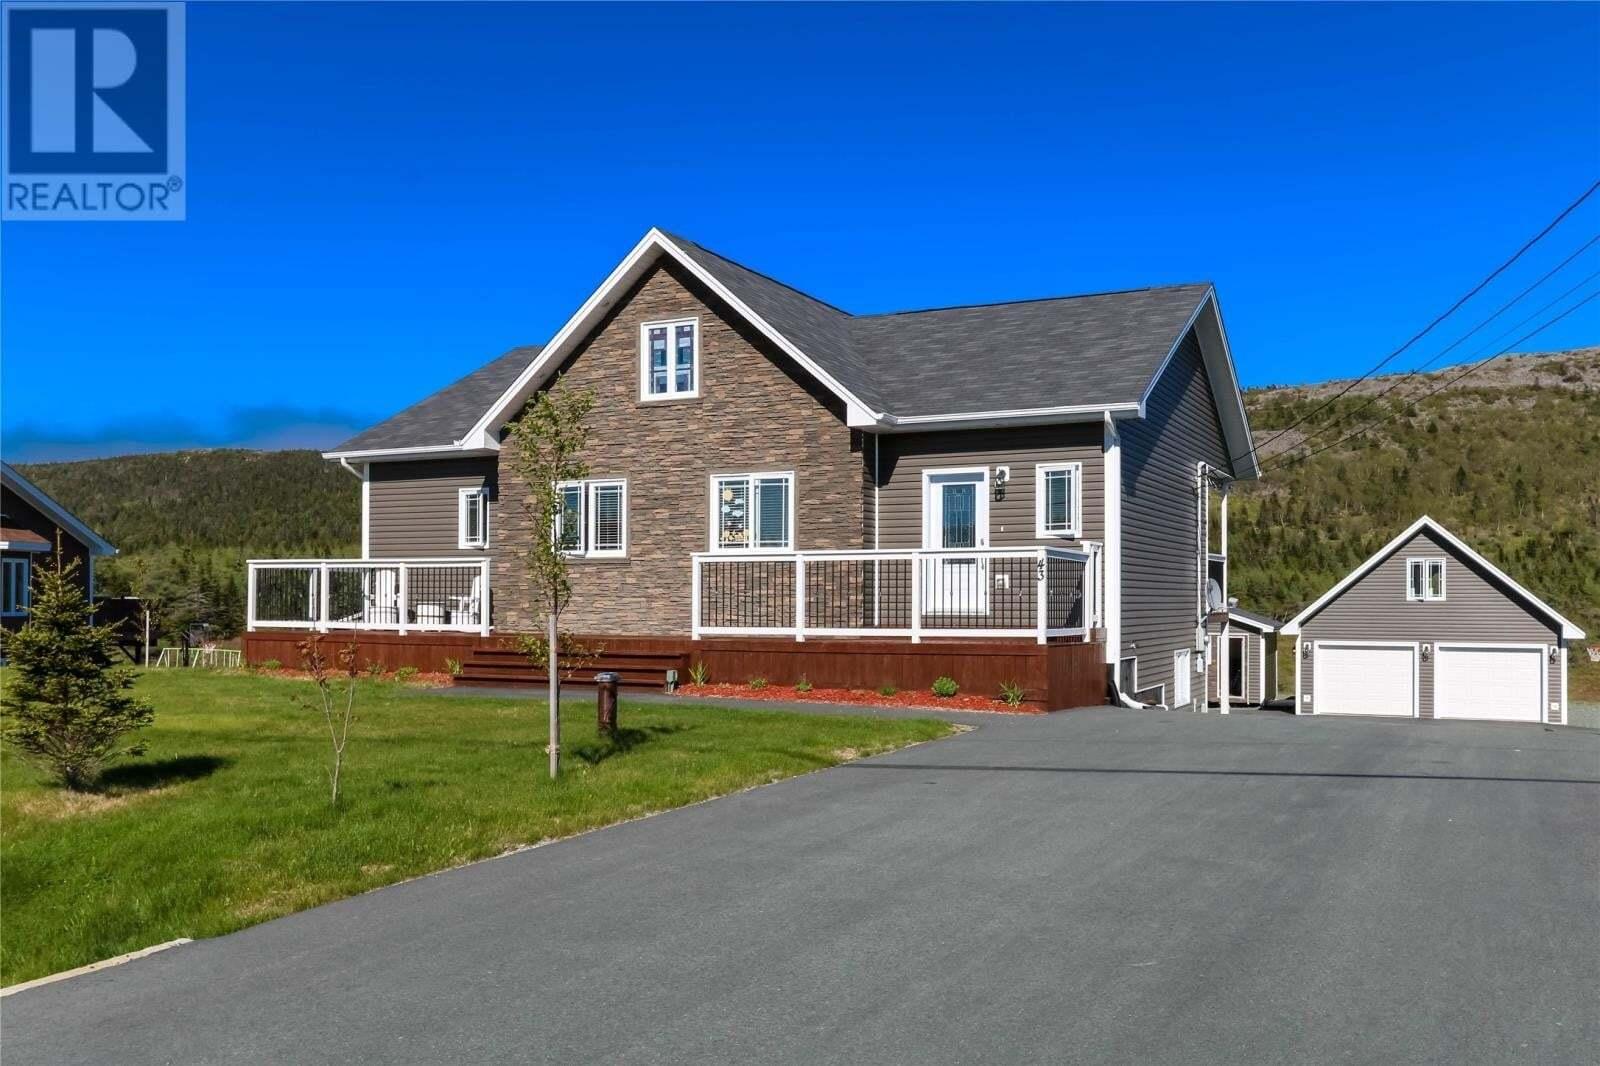 House for sale at 43 Dunn Dr Bay Bulls Newfoundland - MLS: 1216311